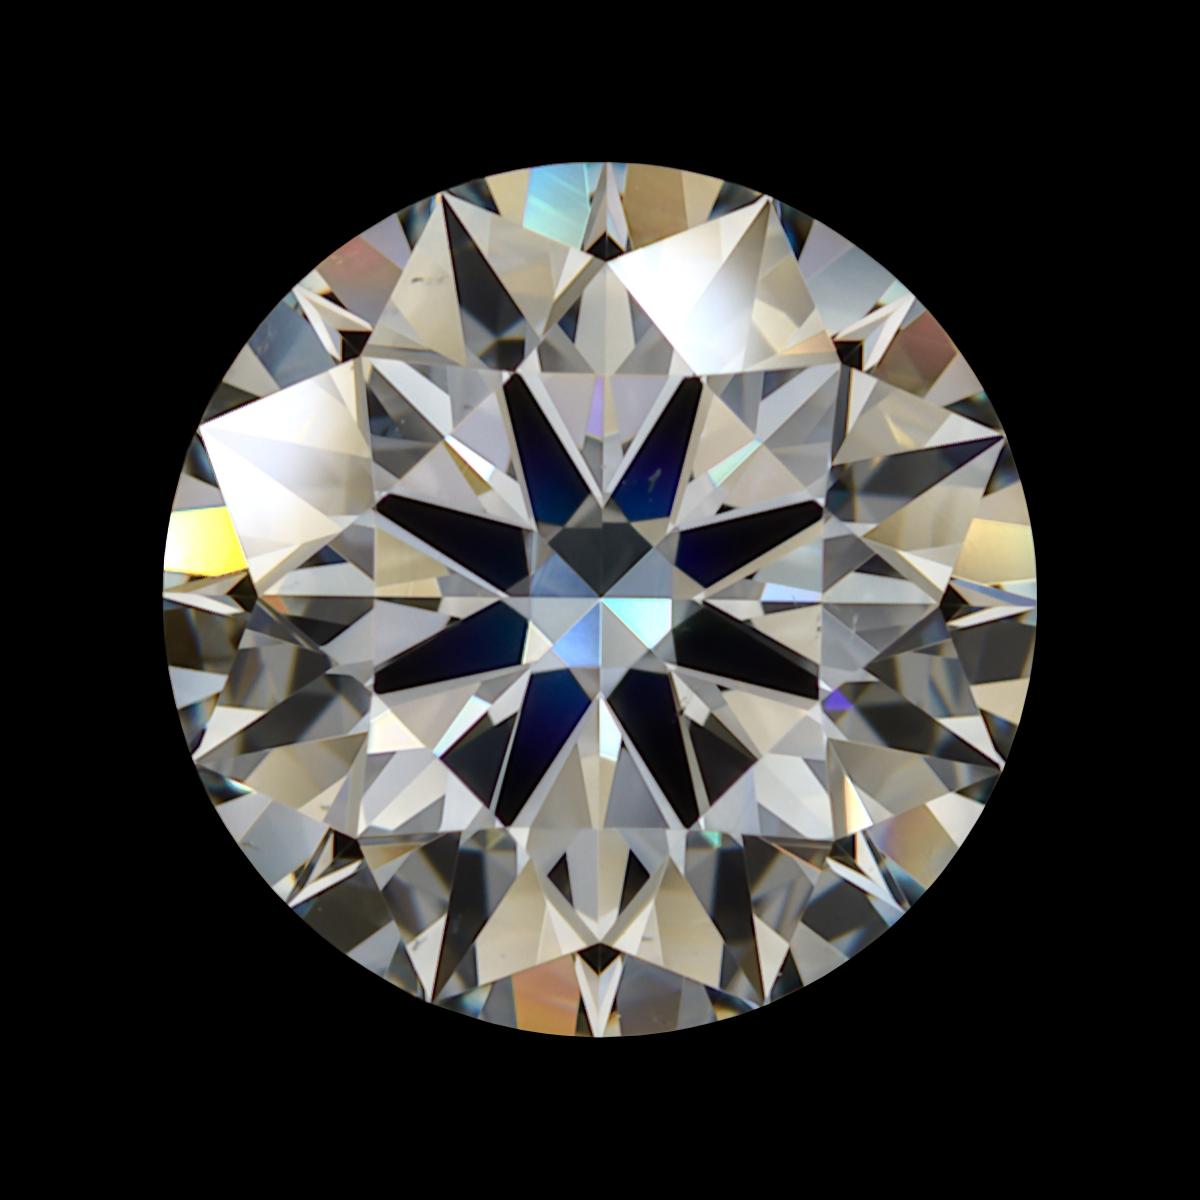 https://cdn.briangavindiamonds.com/files/mp4/AGS-104114551014/AGS-104114551014-Office-02.mp4